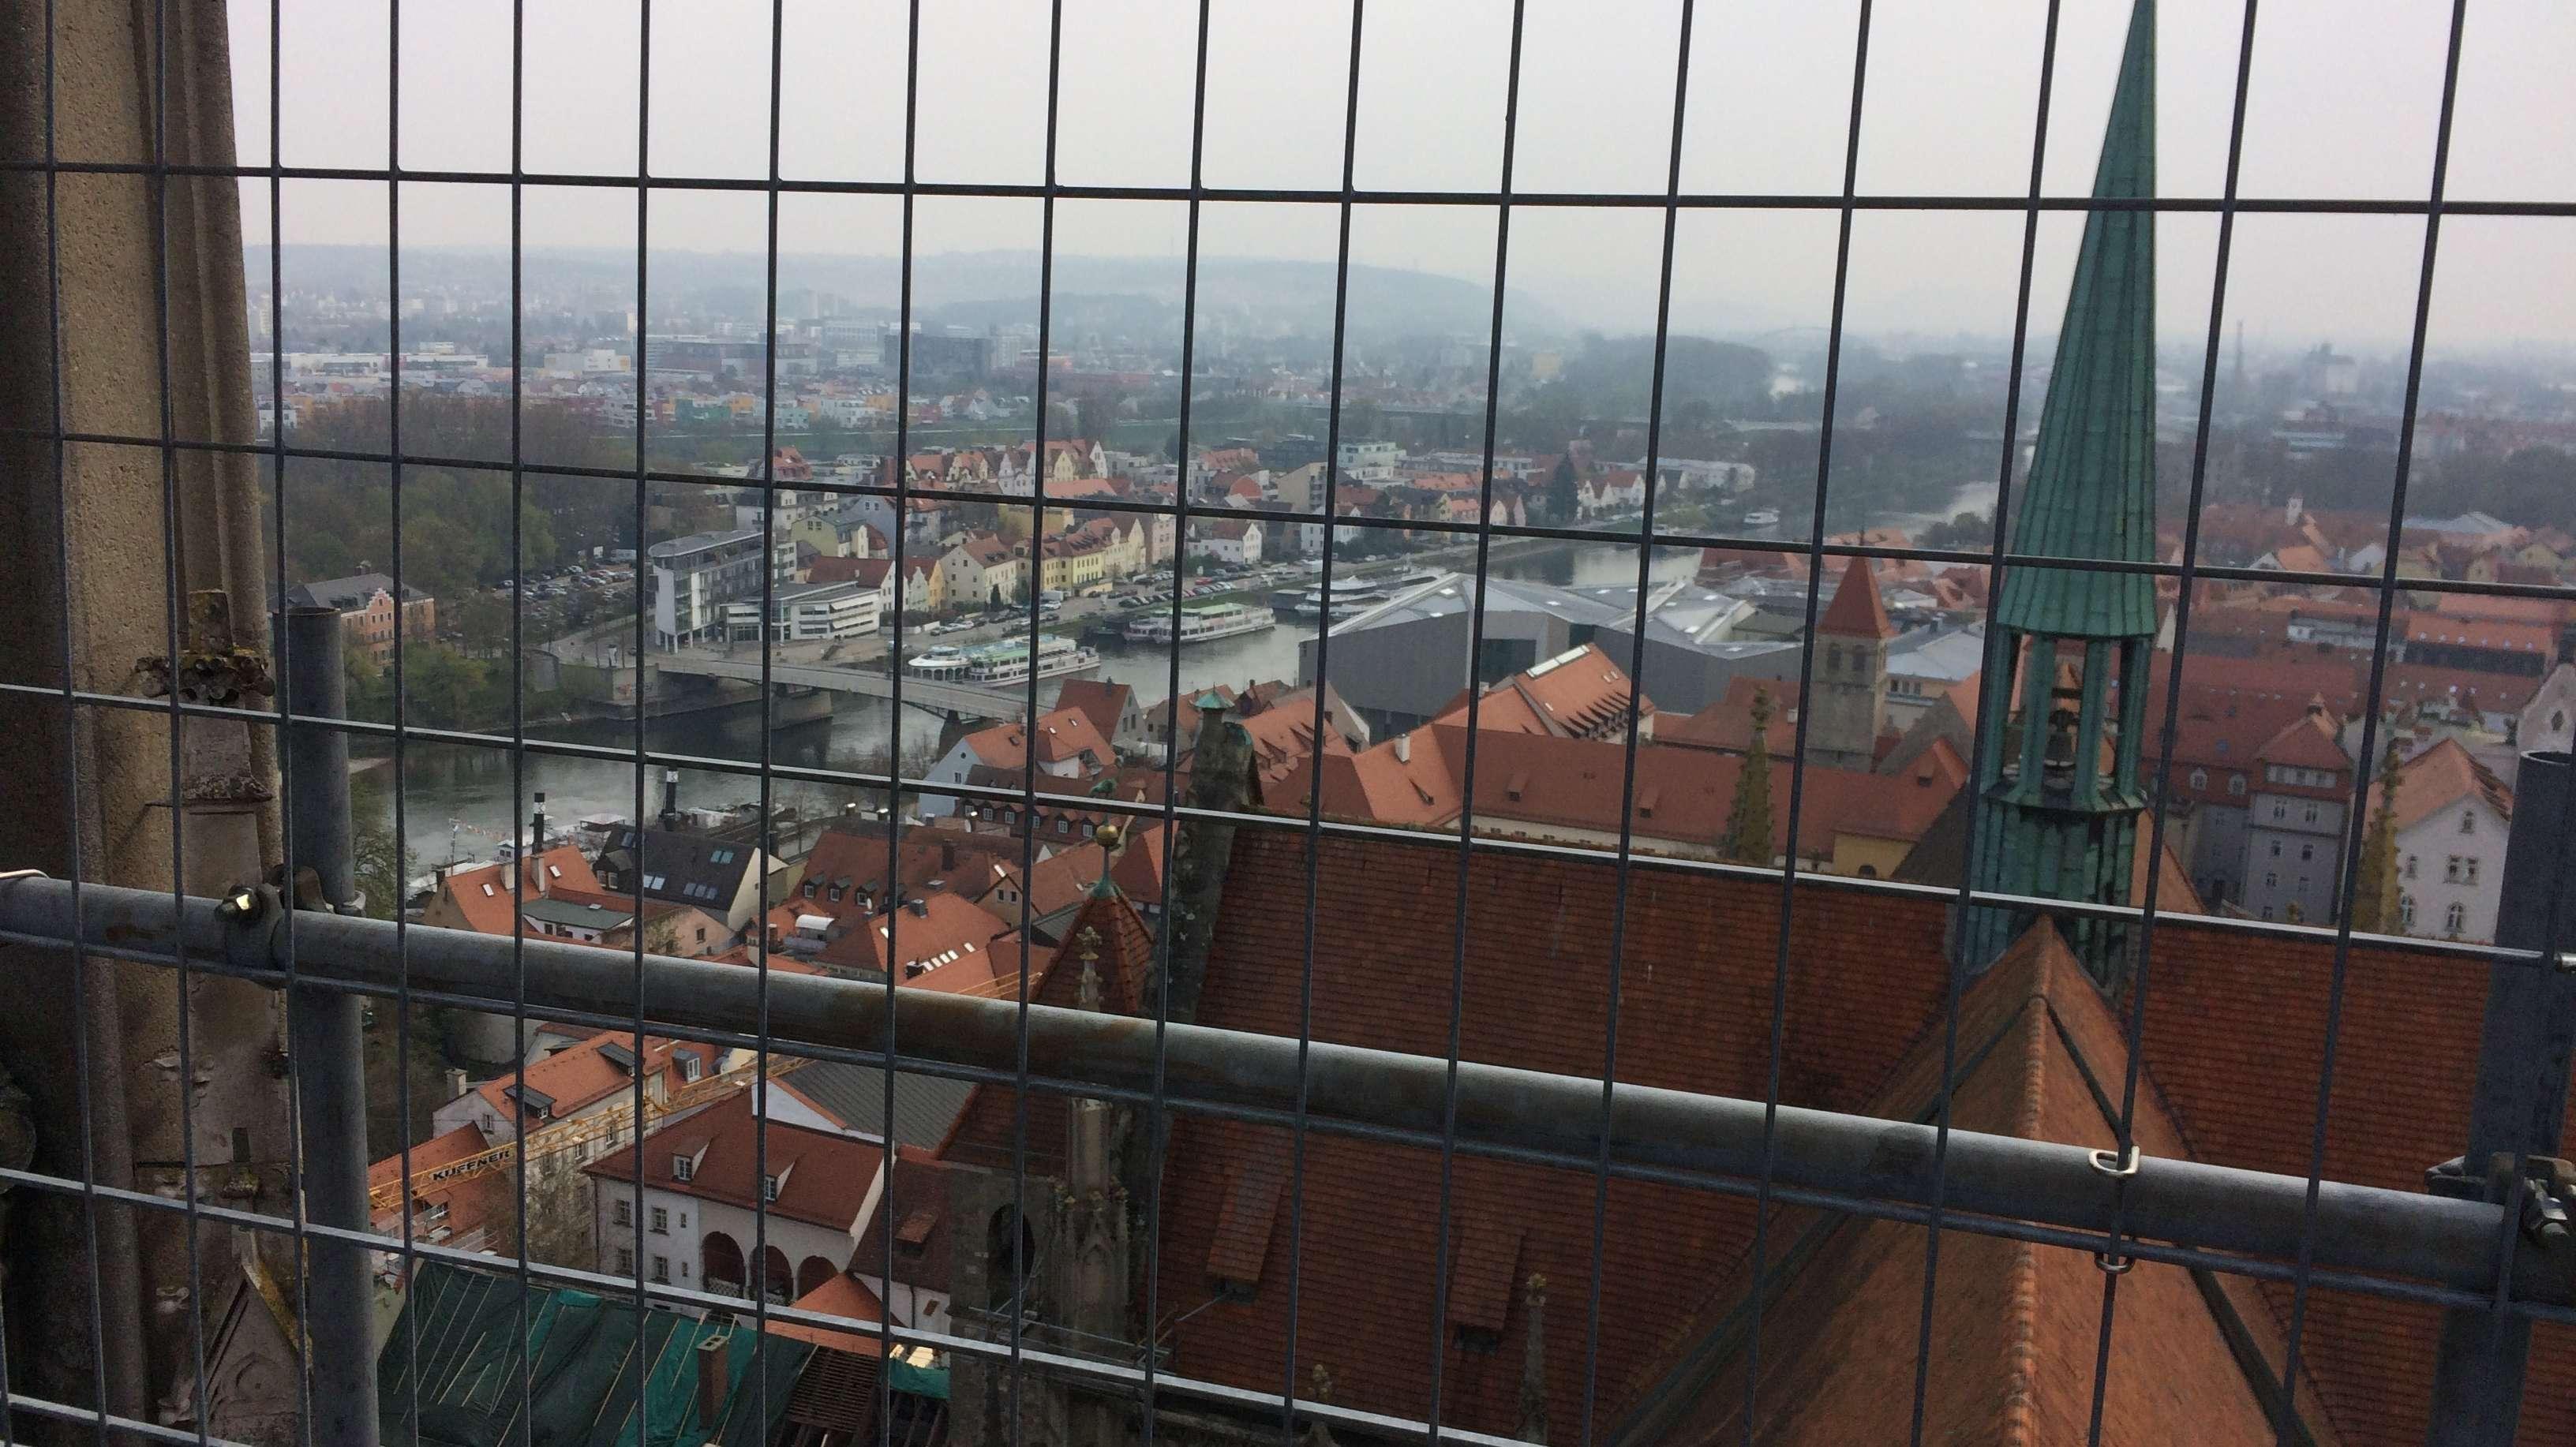 Der Ausblick vom Regensburger Dom.